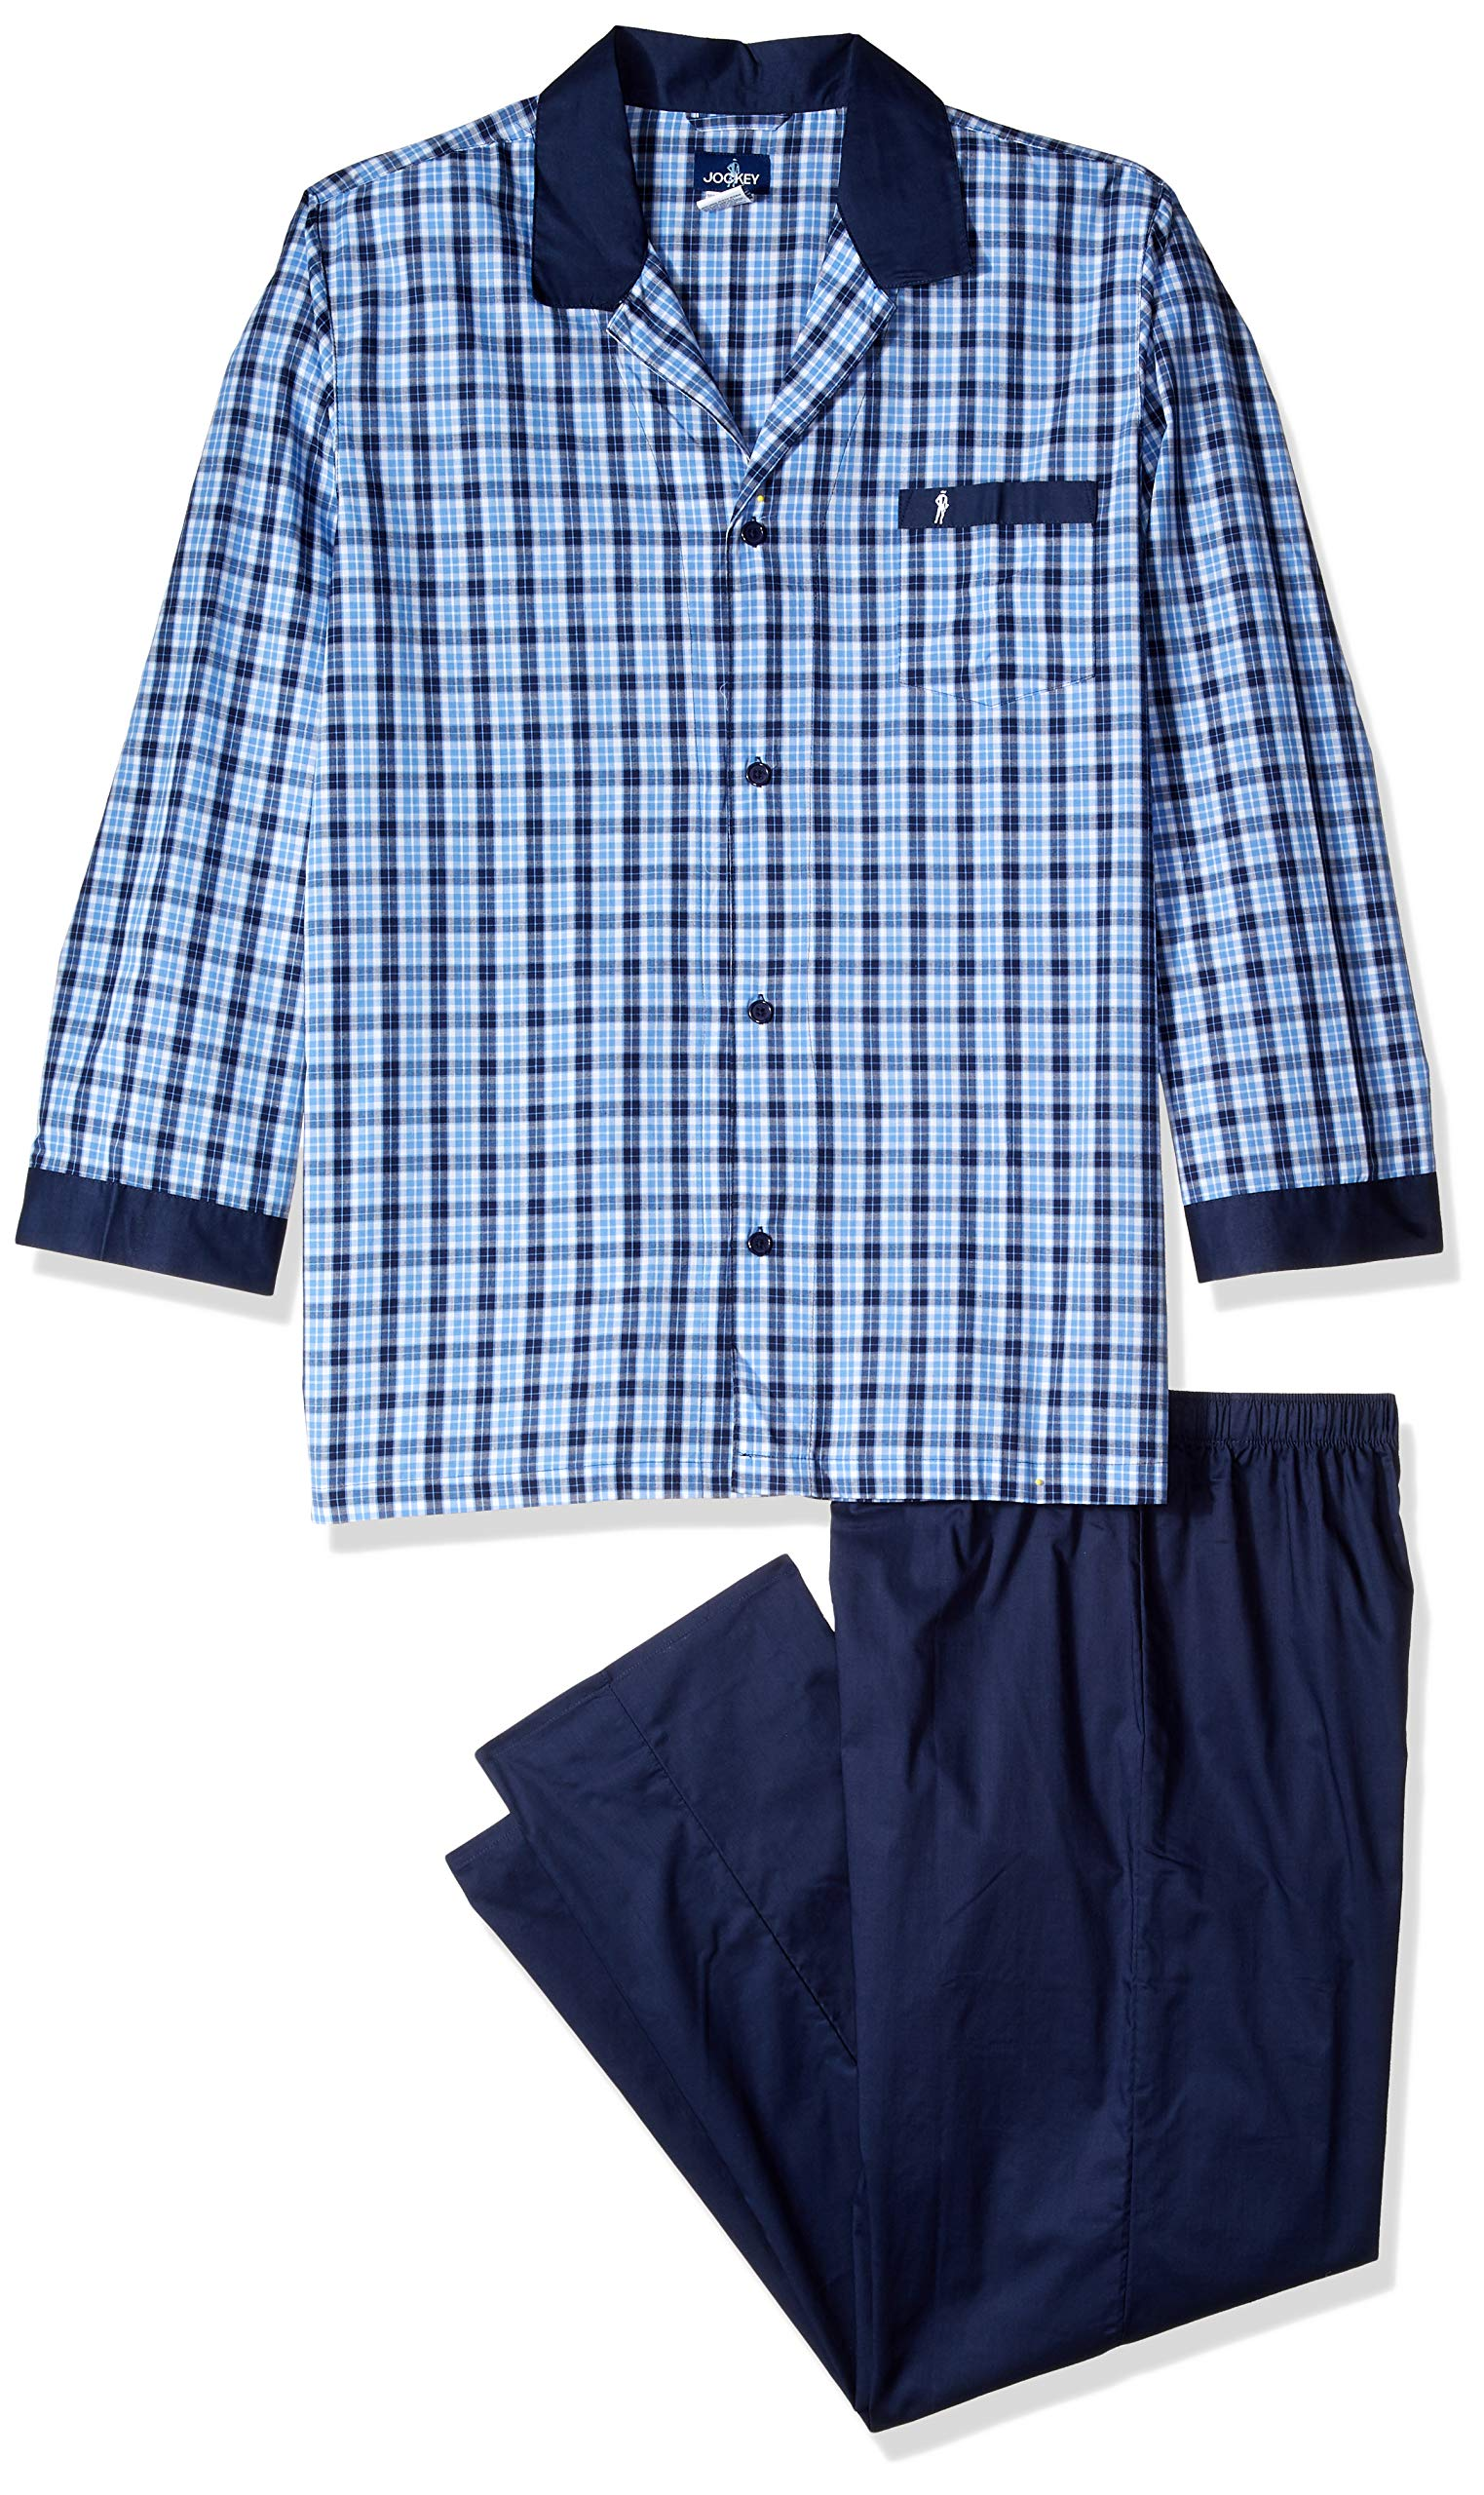 Jockey Men's Size Yarn-dye Woven Long Sleeve Pajama Set, Blue/White Plaid X-Large-Tall